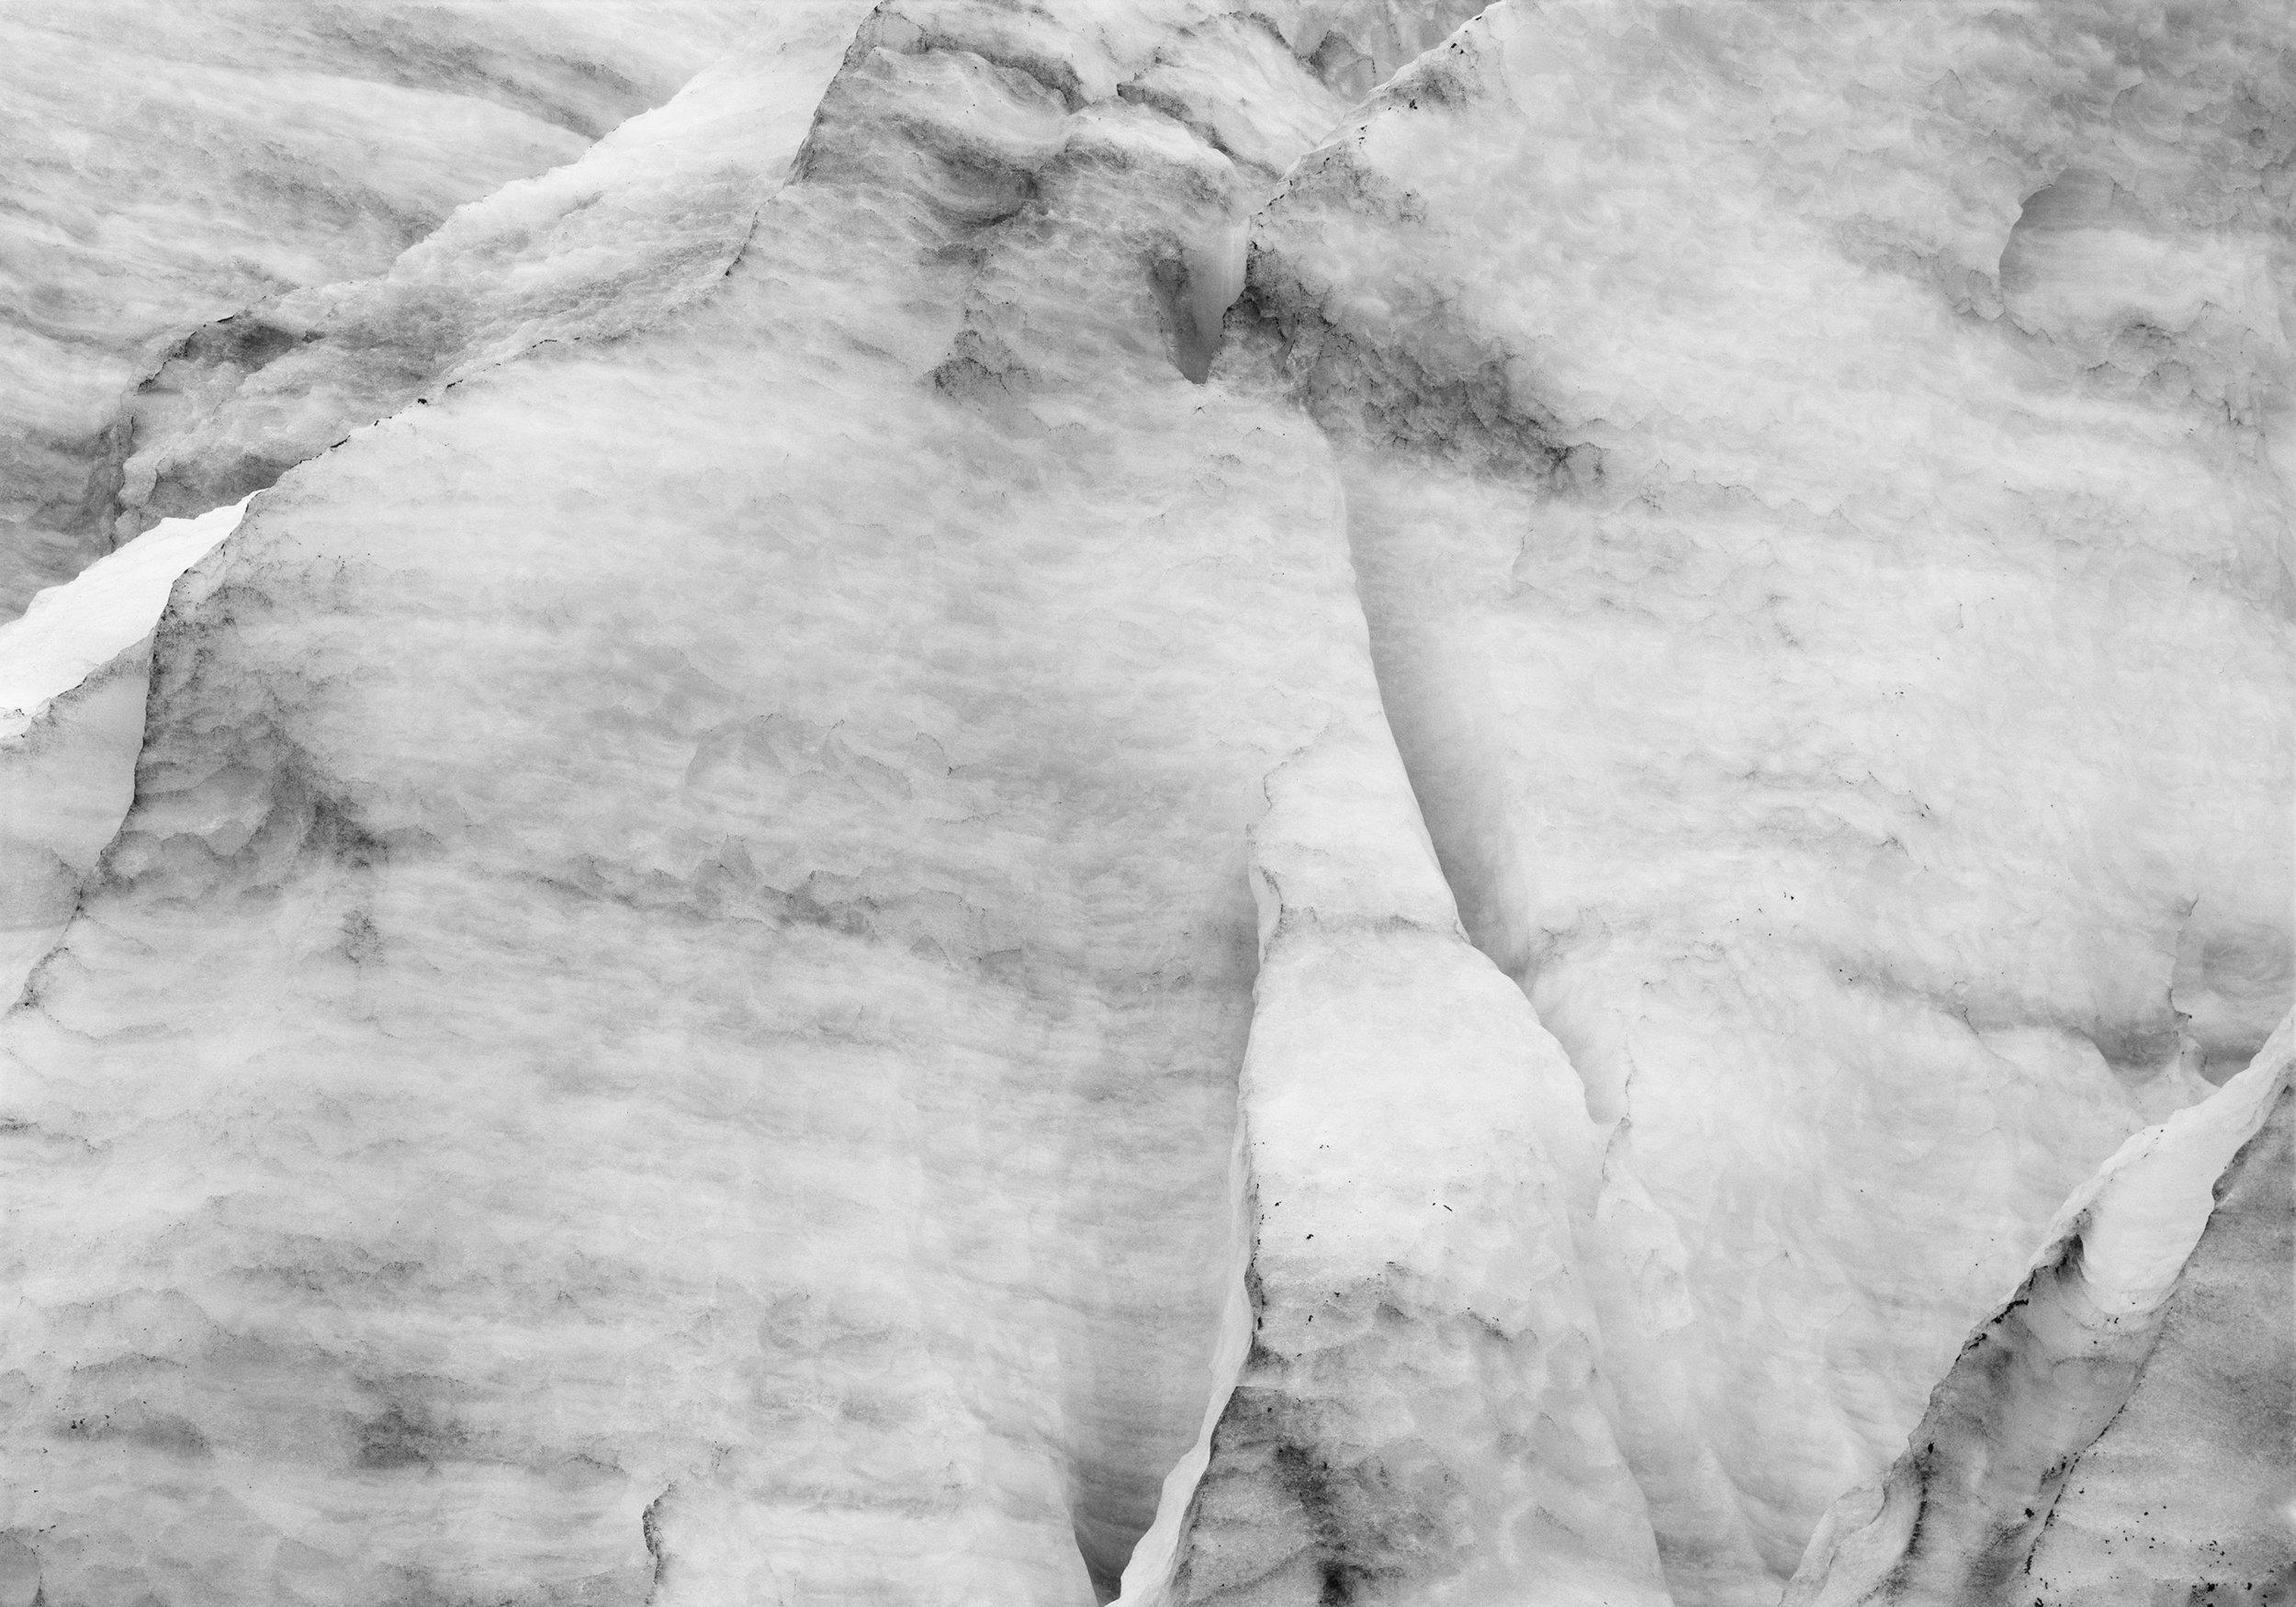 Sasha Bezzubov, Ice 05, Photograph, Archival Pigment Print